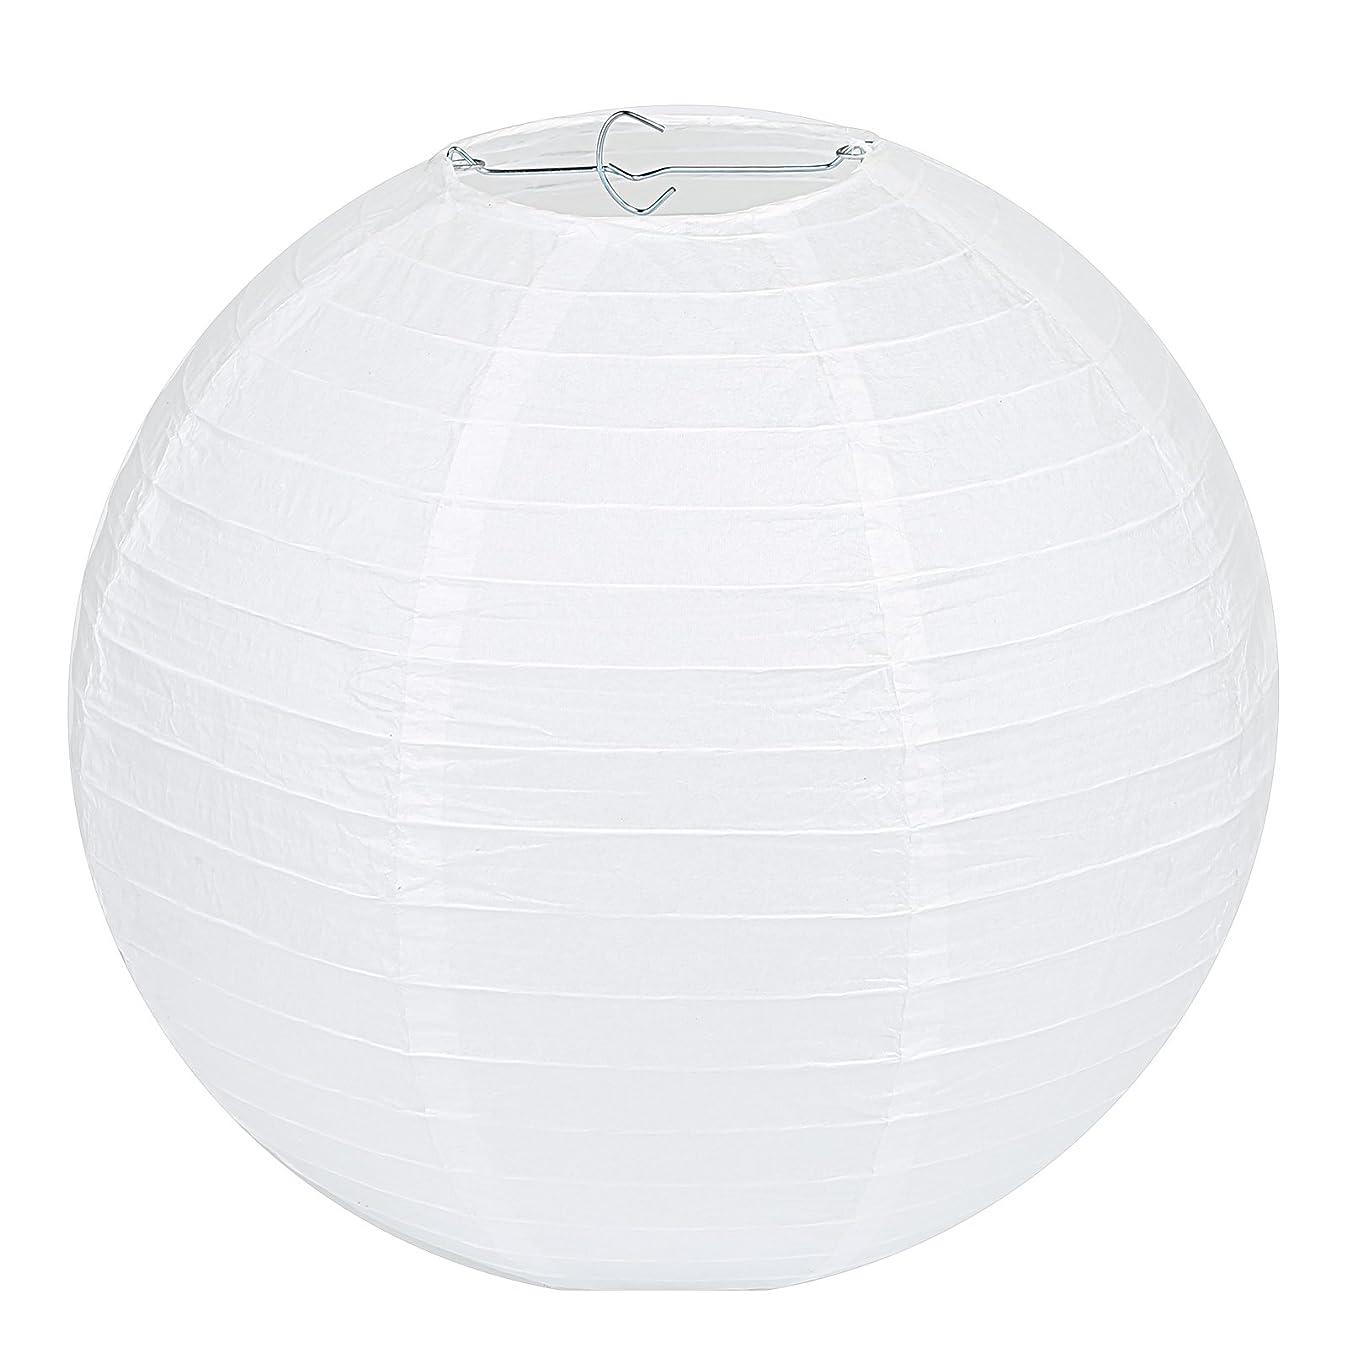 LIHAO 12 Inch White Round Paper Lanterns (10 Pack)